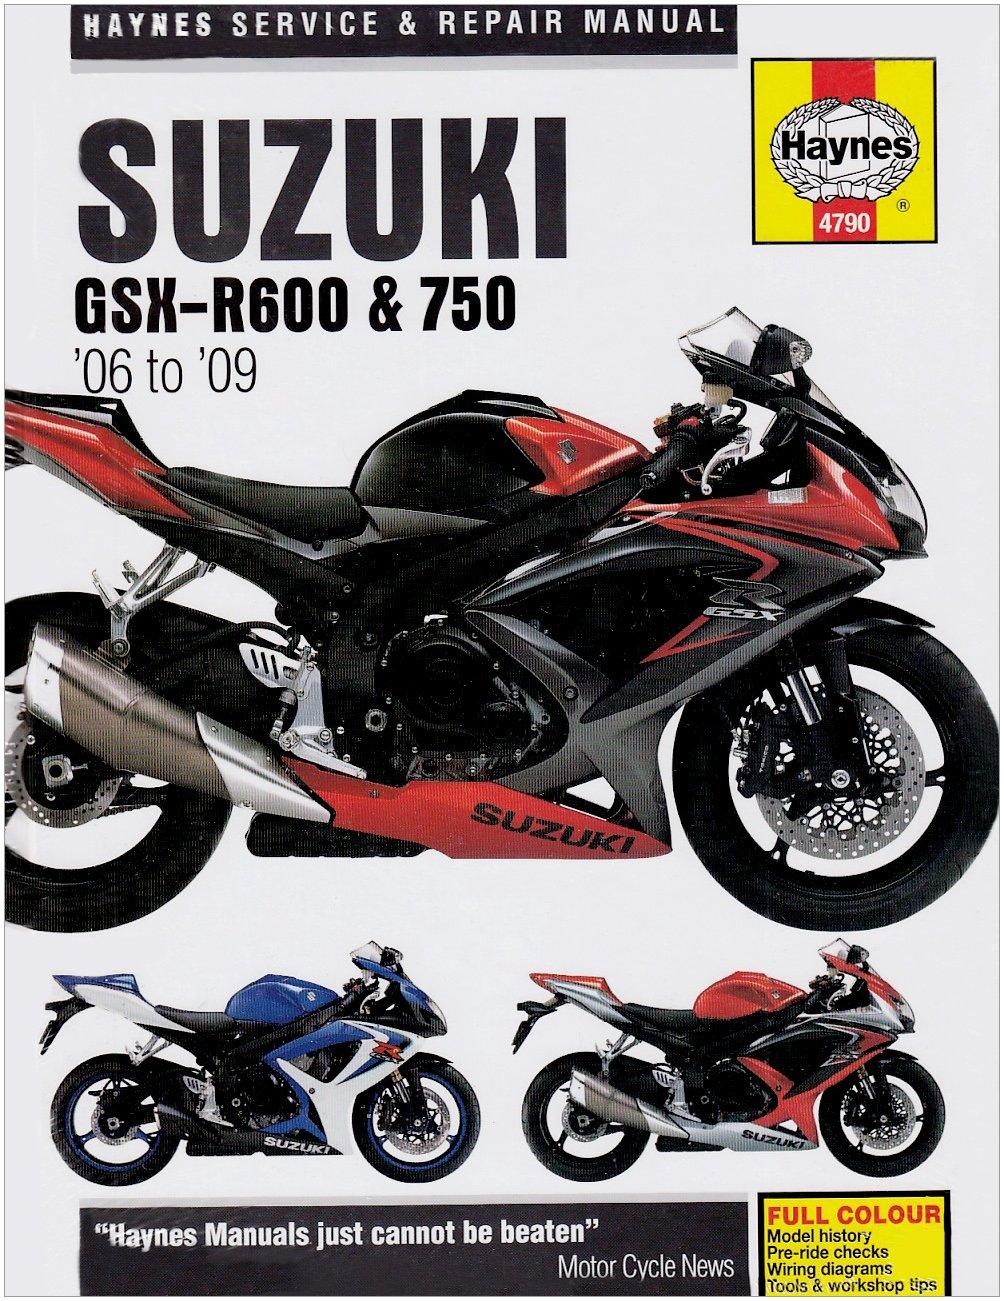 2006 suzuki dl1000 service manual